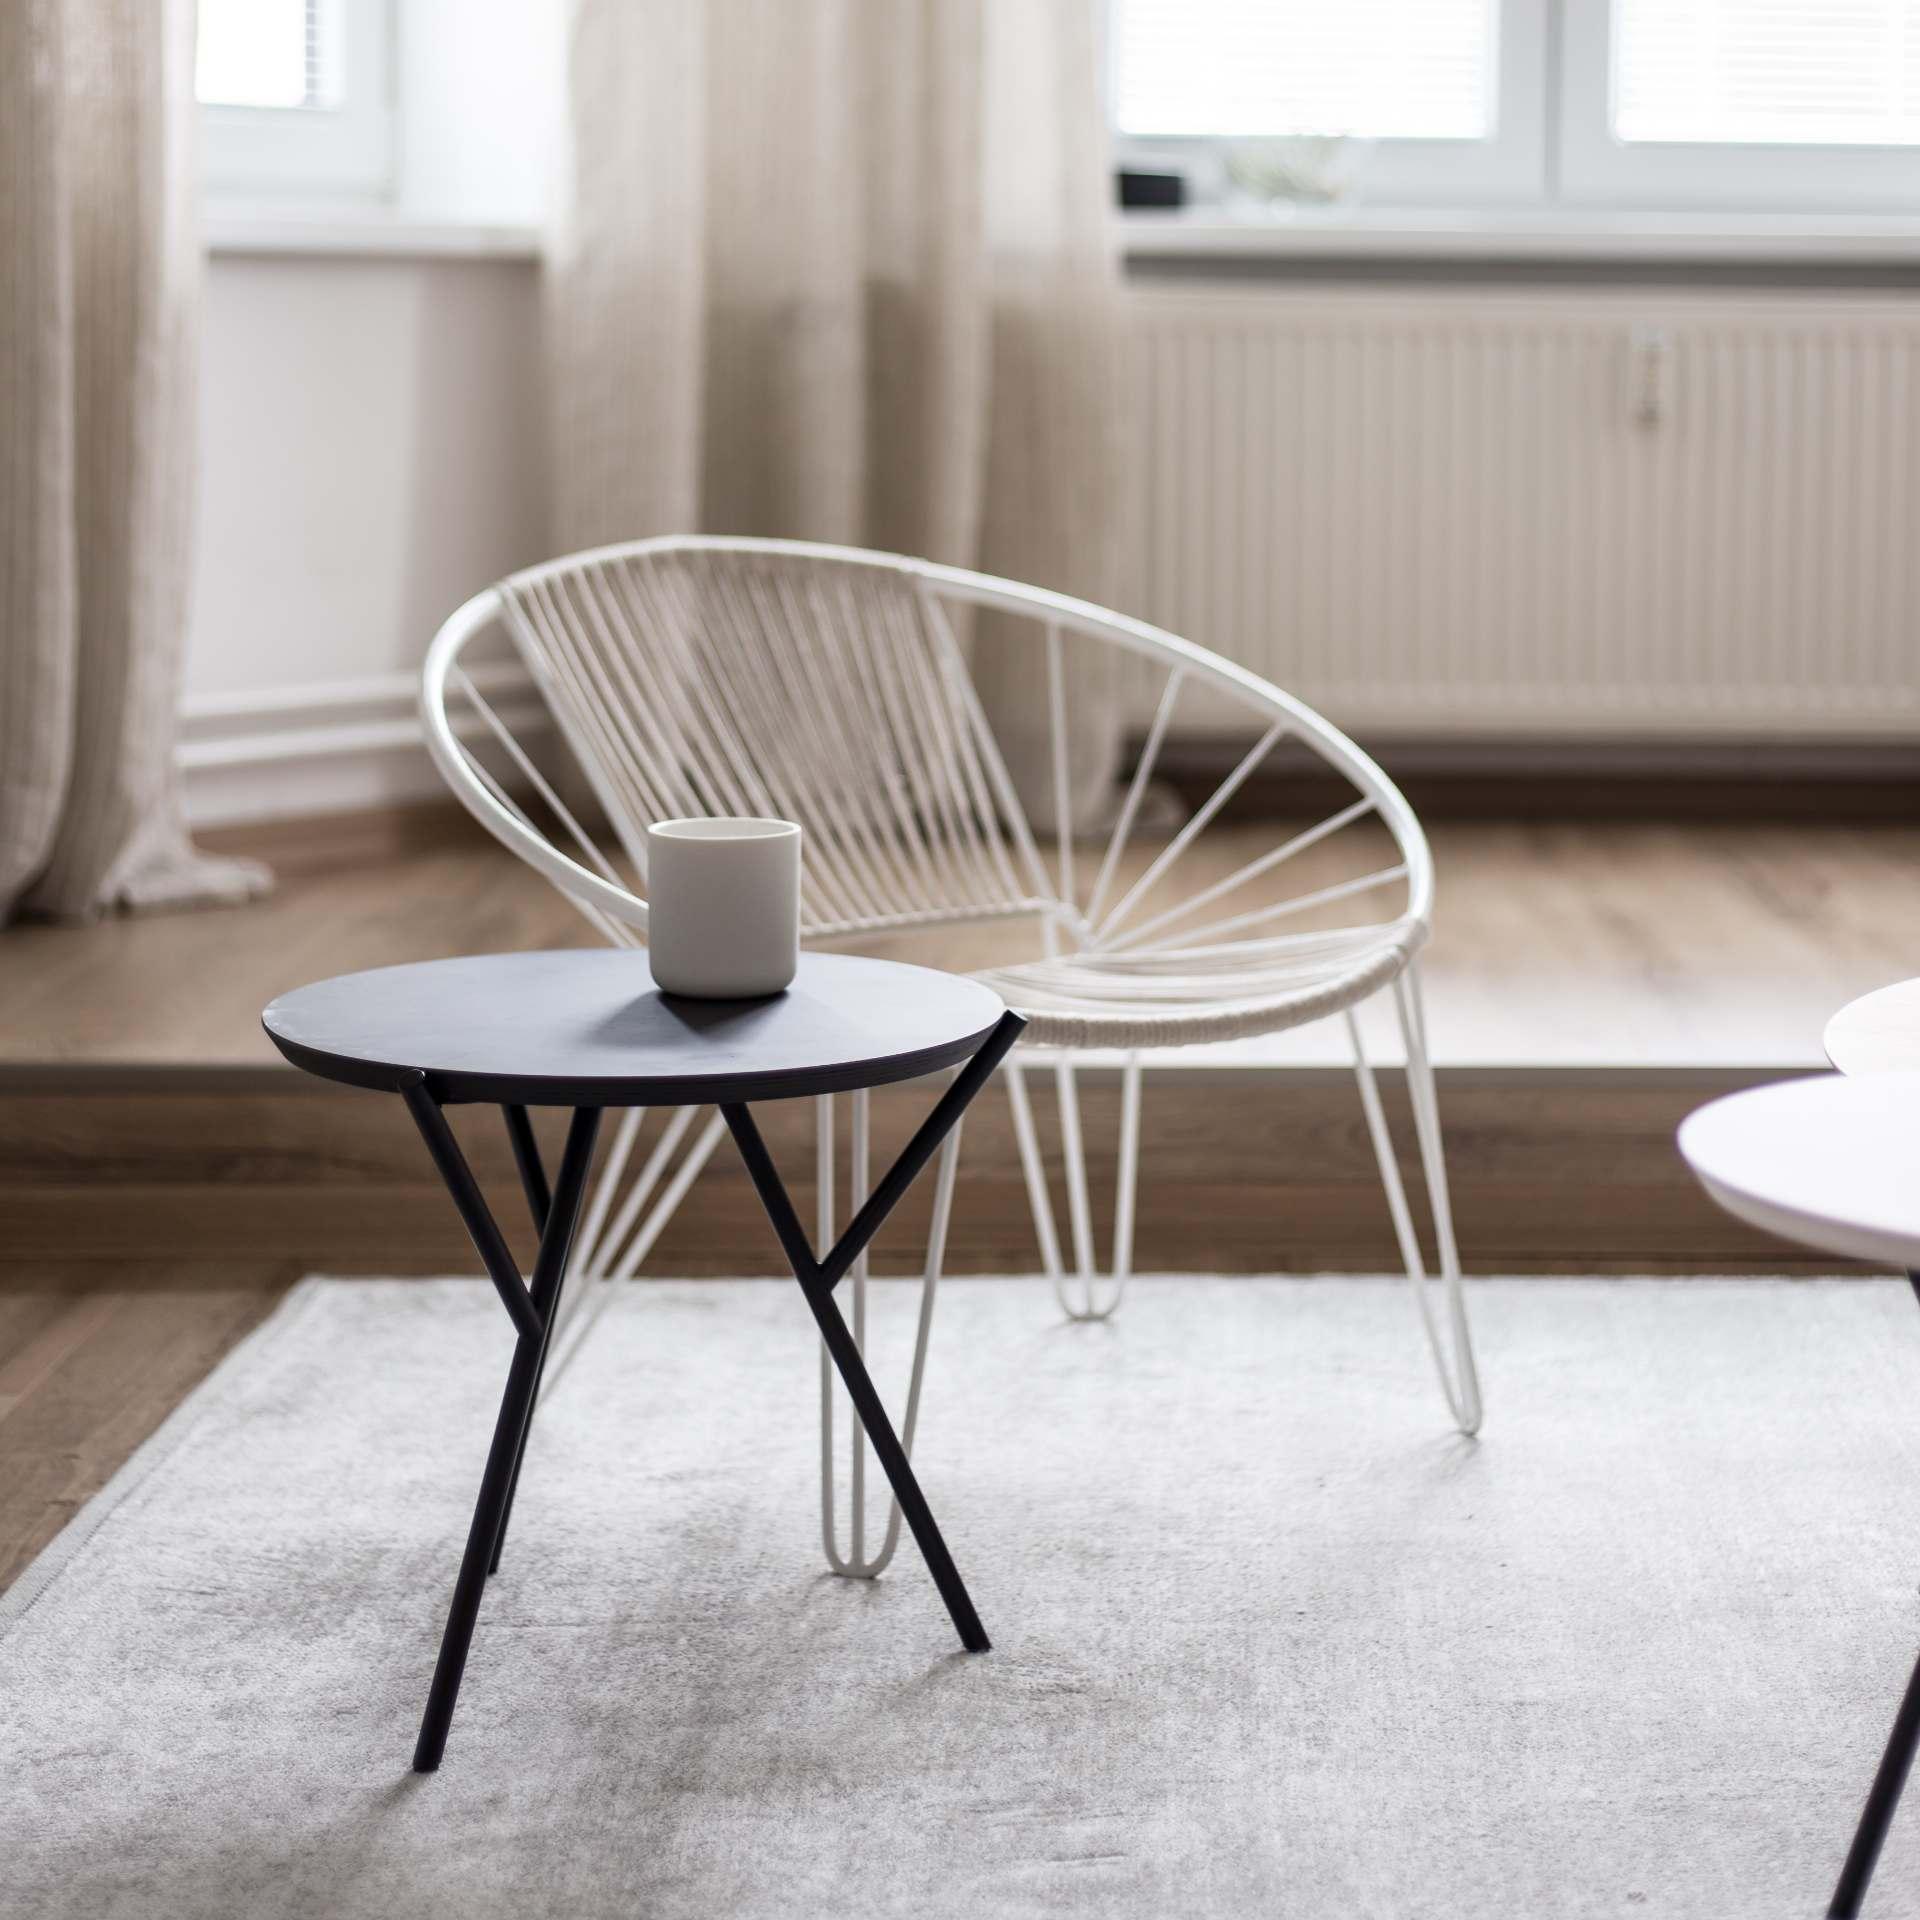 LOW BLACK SIDE TABLE LEGS - 3 PCS | Martin Foret